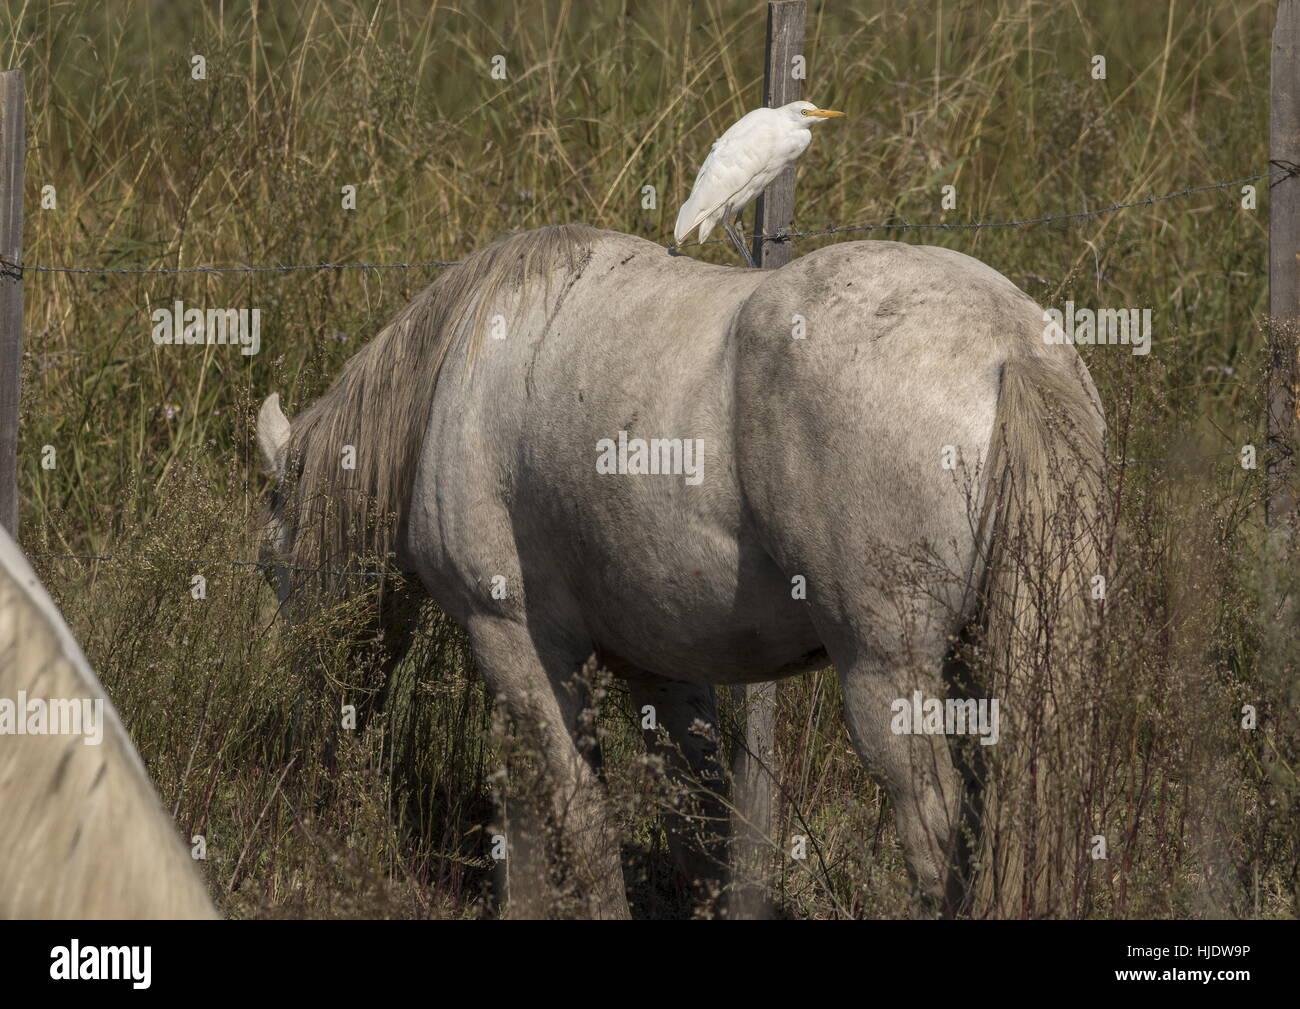 Cattle Egret, Bubulcus ibis, on the back of Camargue, White Horses, Camargue, France. Stock Photo